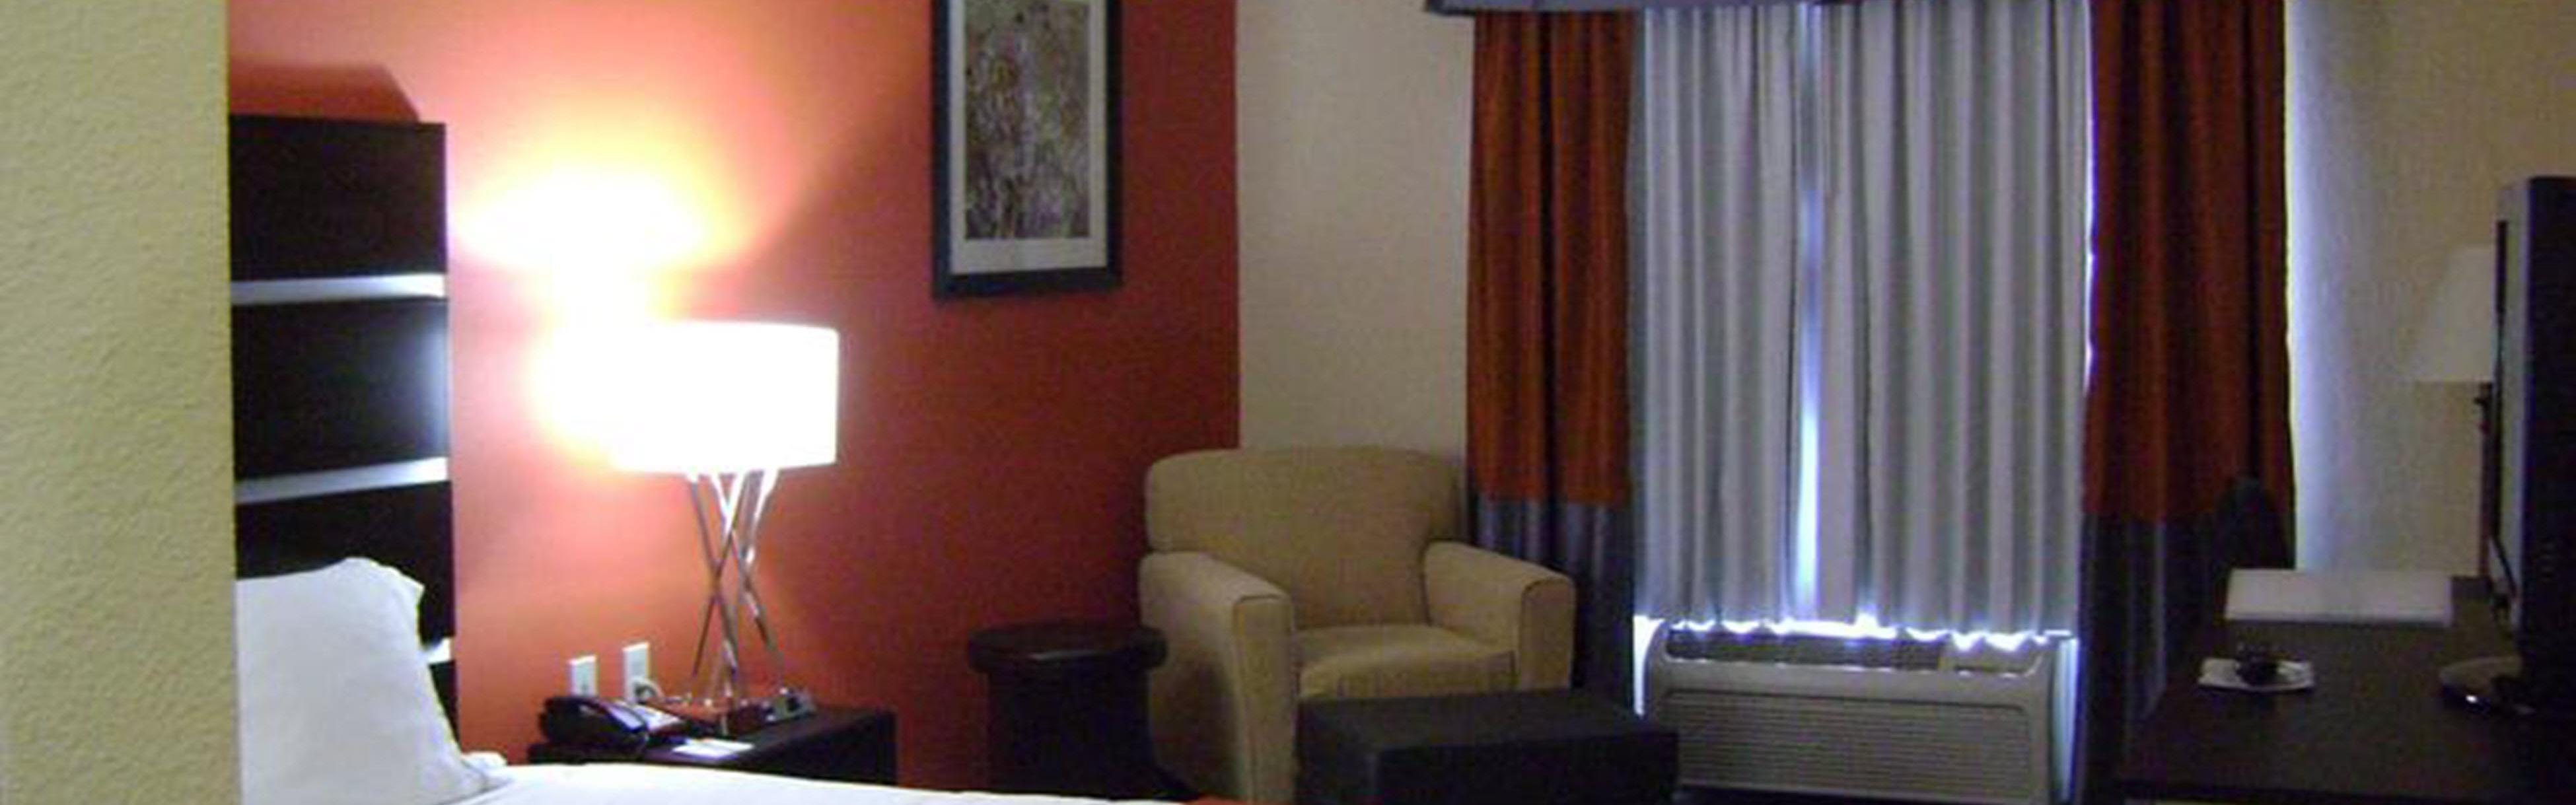 Holiday Inn Express & Suites Kingwood - Medical Center Area image 1